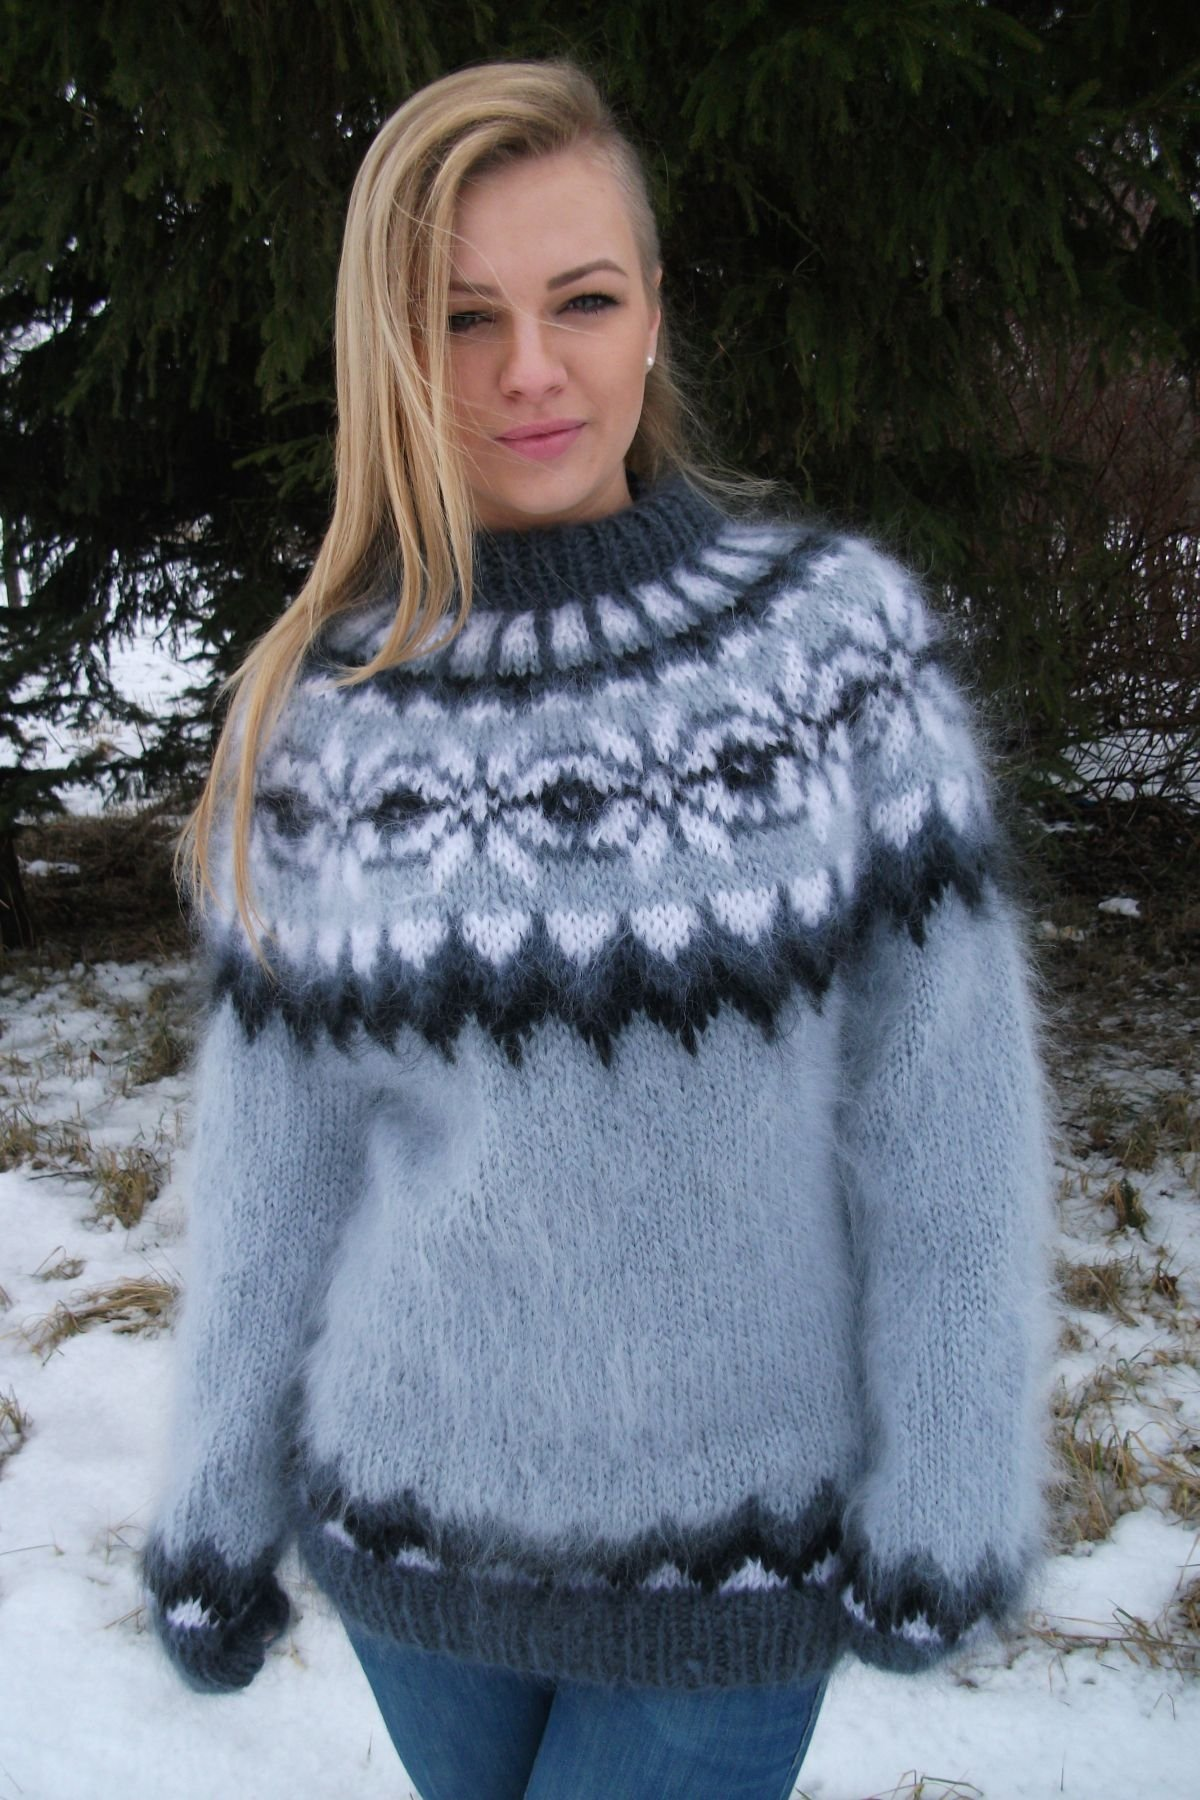 Stardust reccomend Mohair wool sweater bondage pics